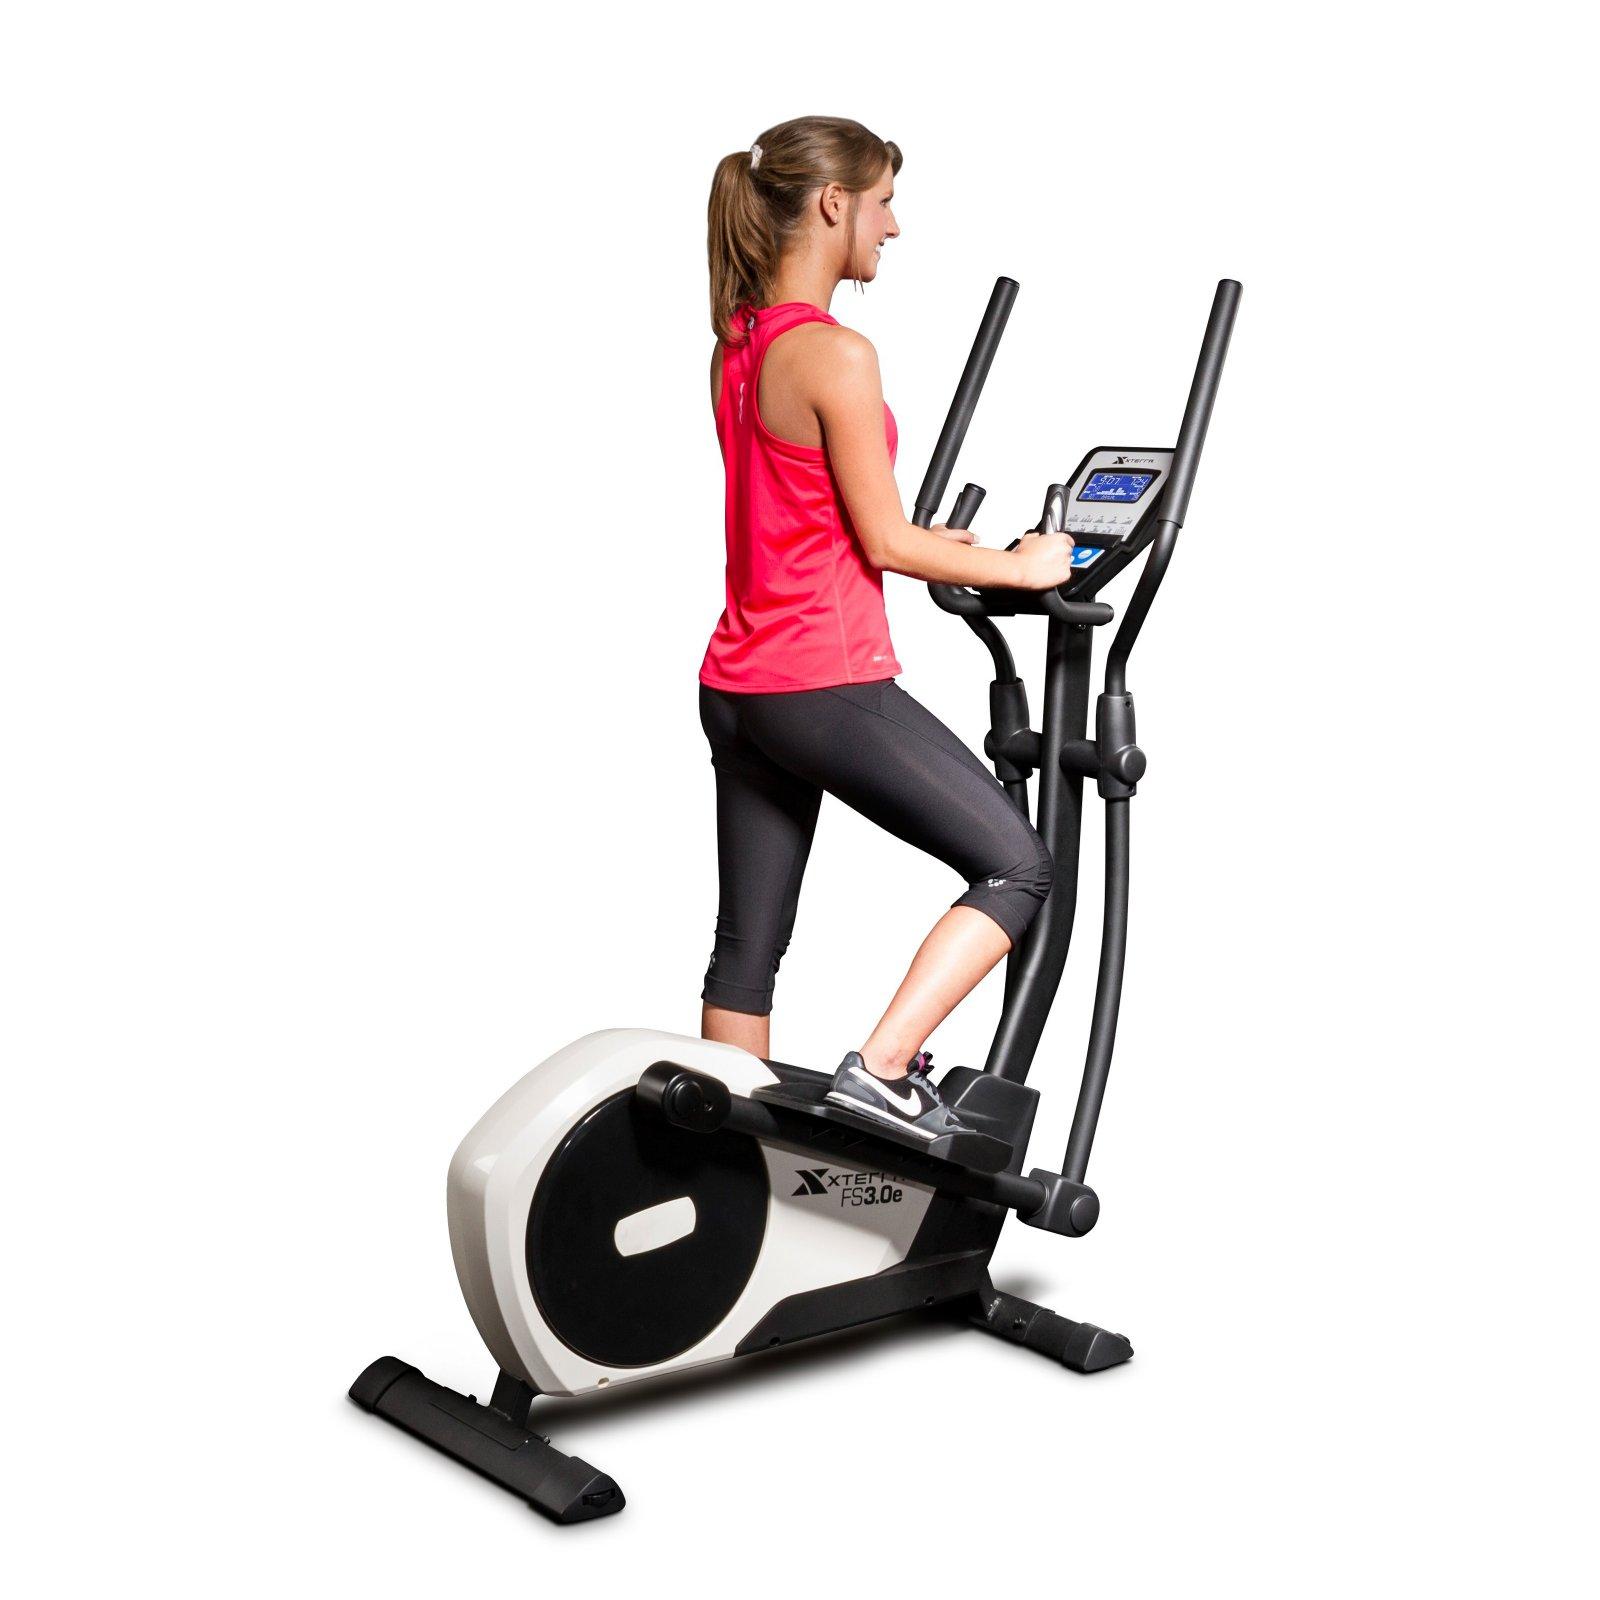 XTERRA Fitness FS3.0 Elliptical Machine With Ergonomic